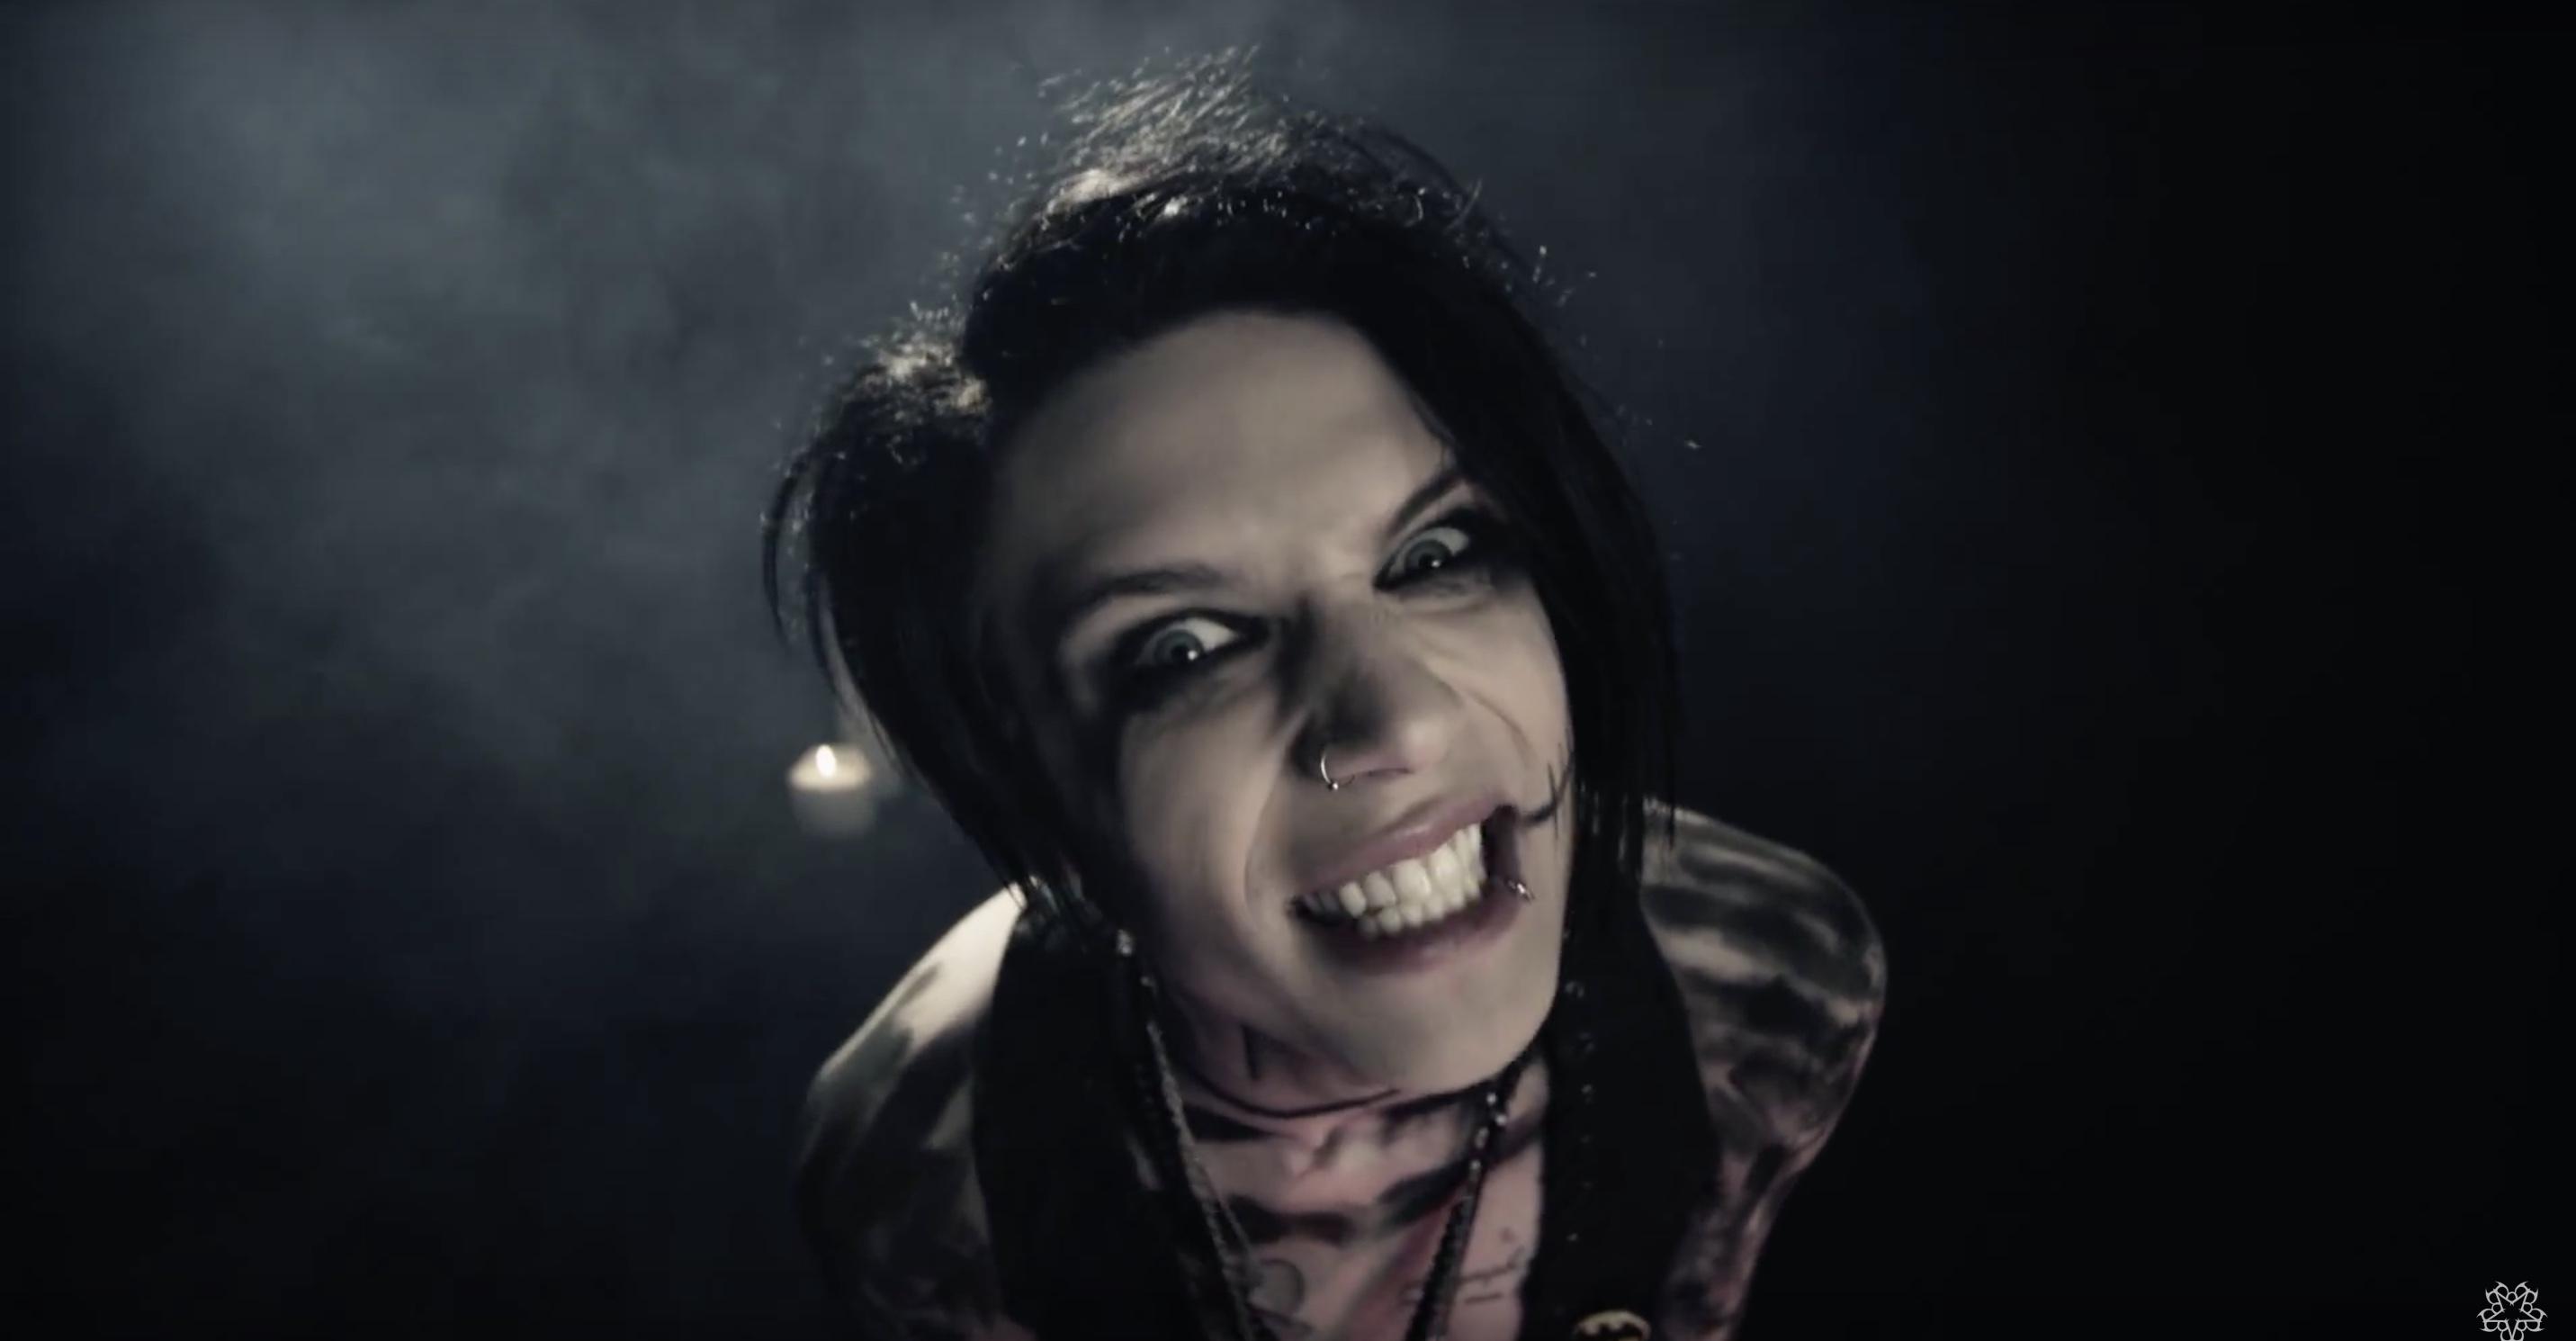 Andy Biersack Smiling 2012